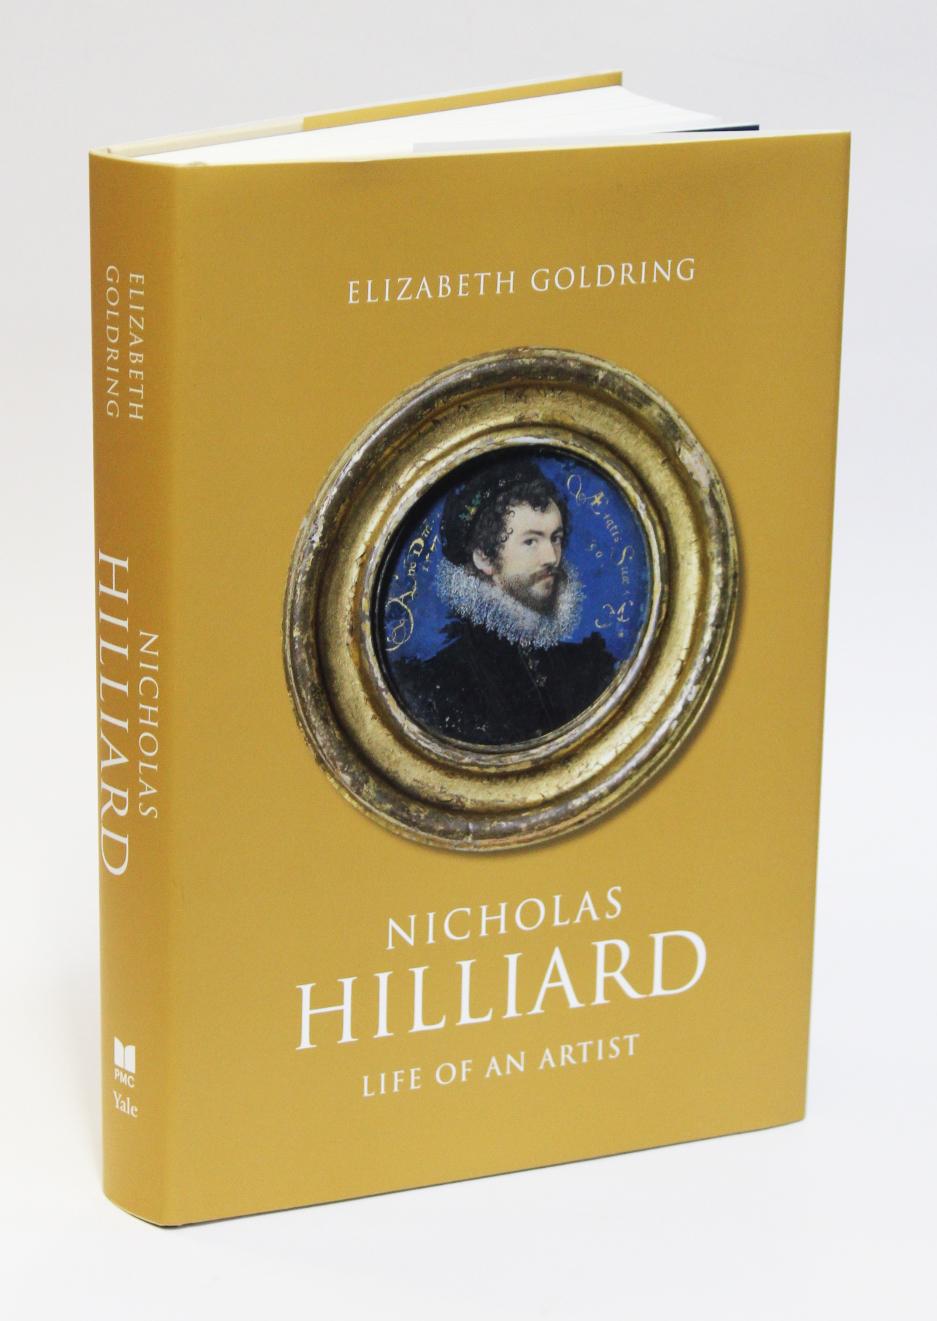 Nicholas Hilliard